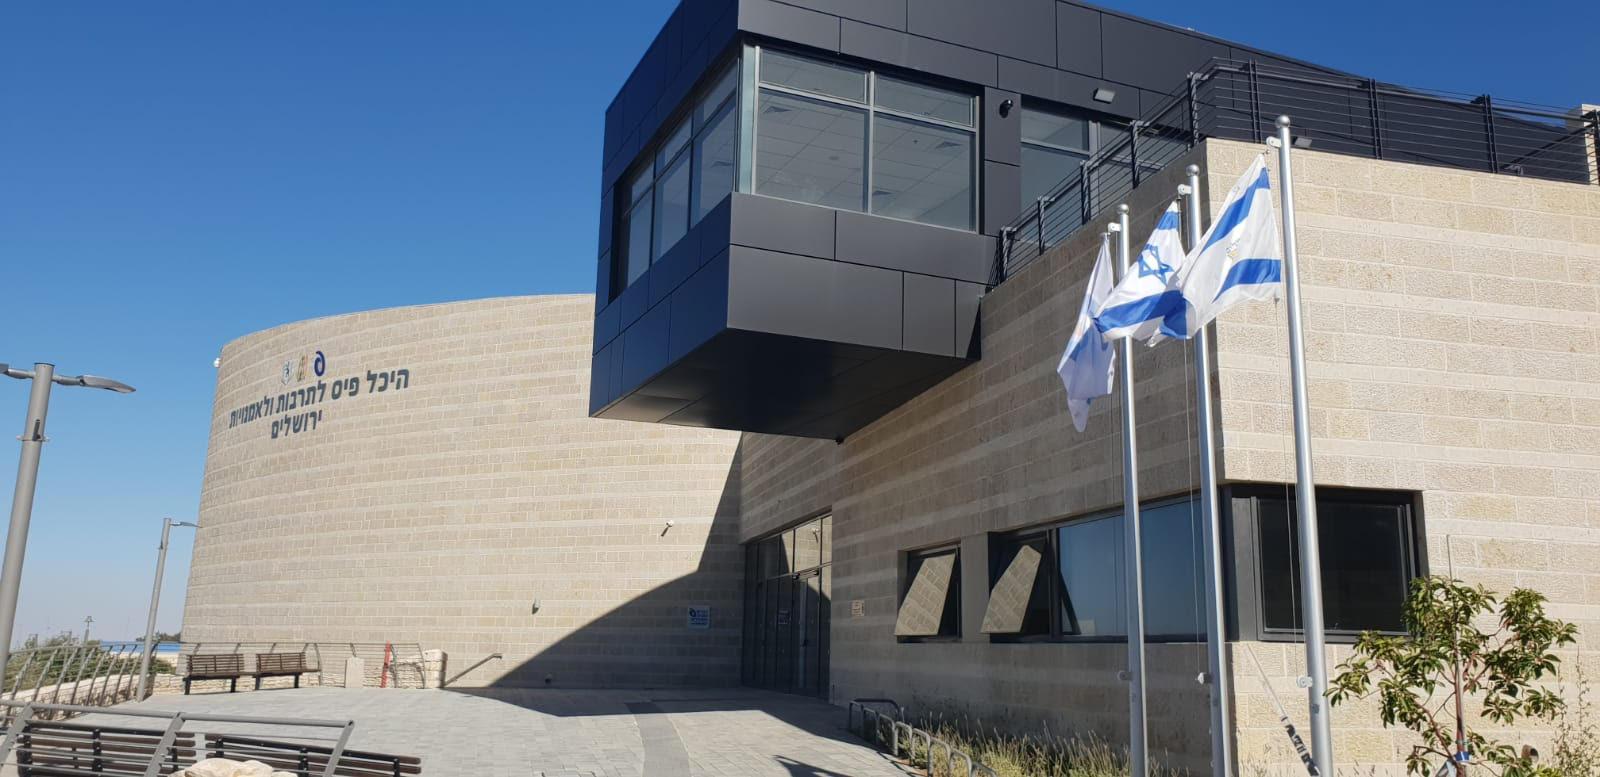 Exterior view of Jerusalem Heichal Payis